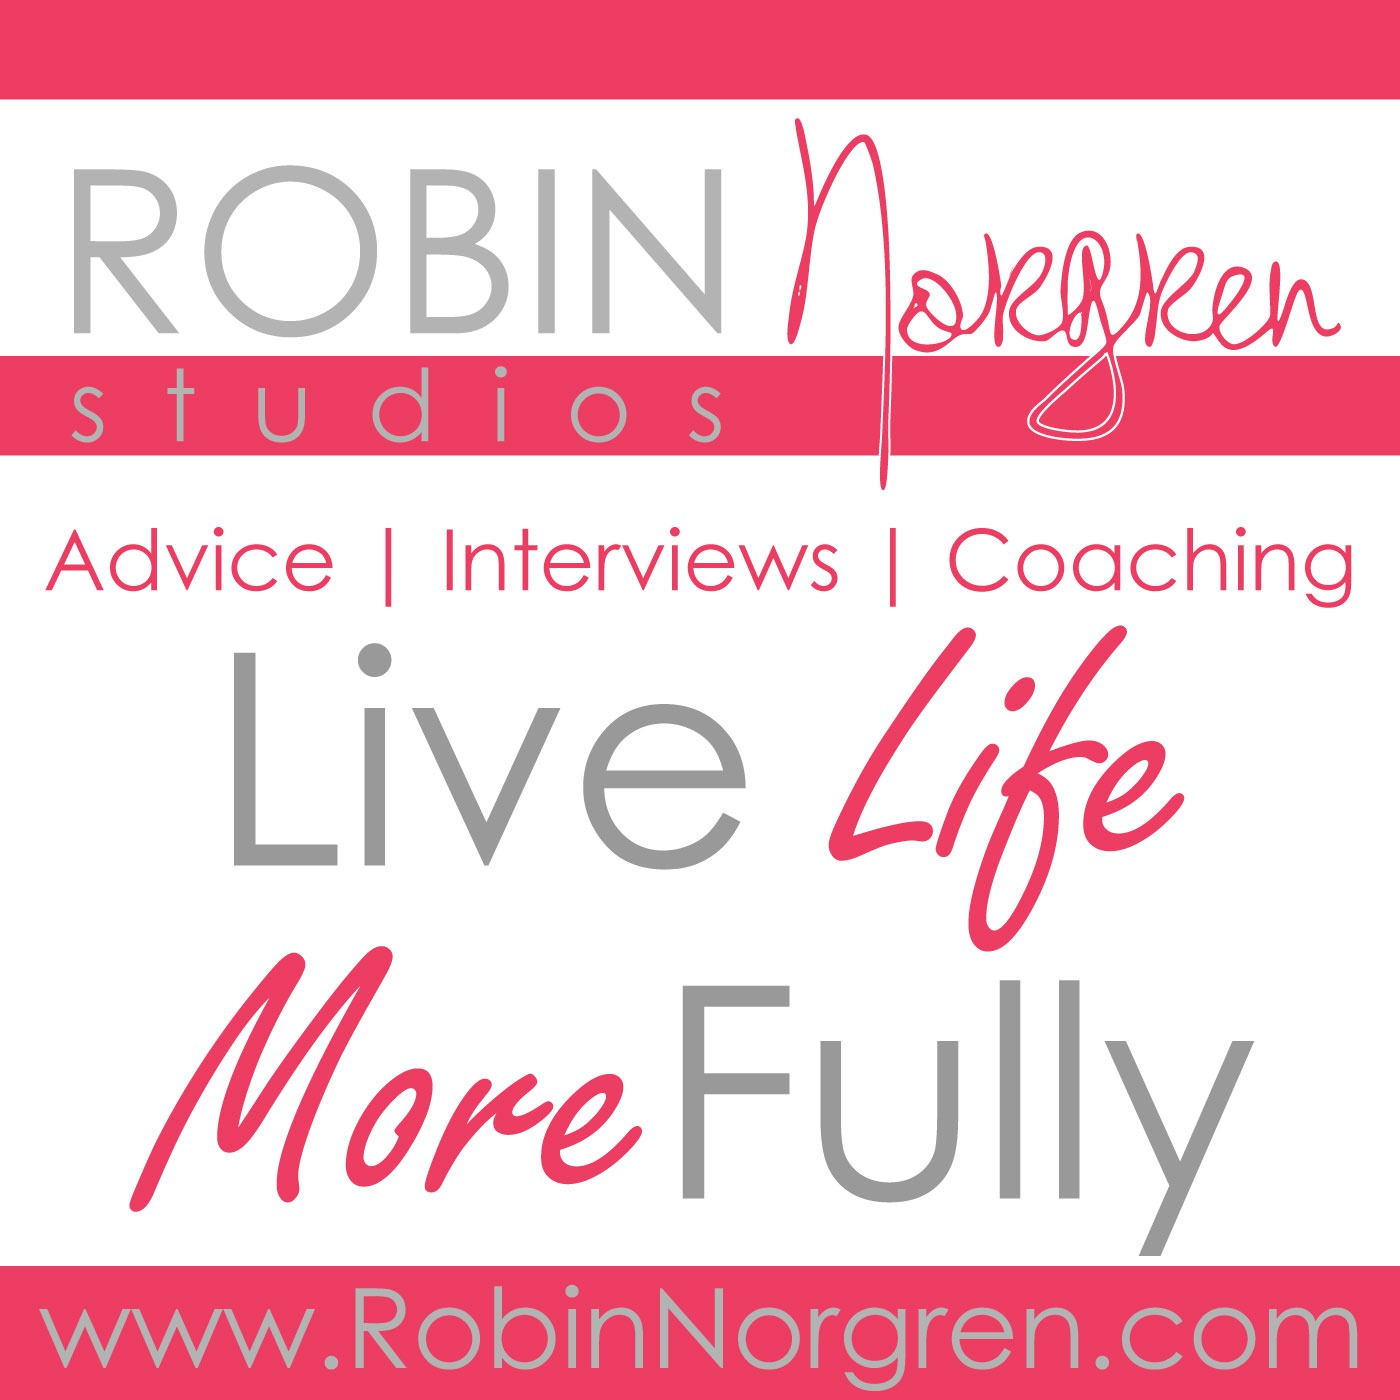 Robin Norgren Studios